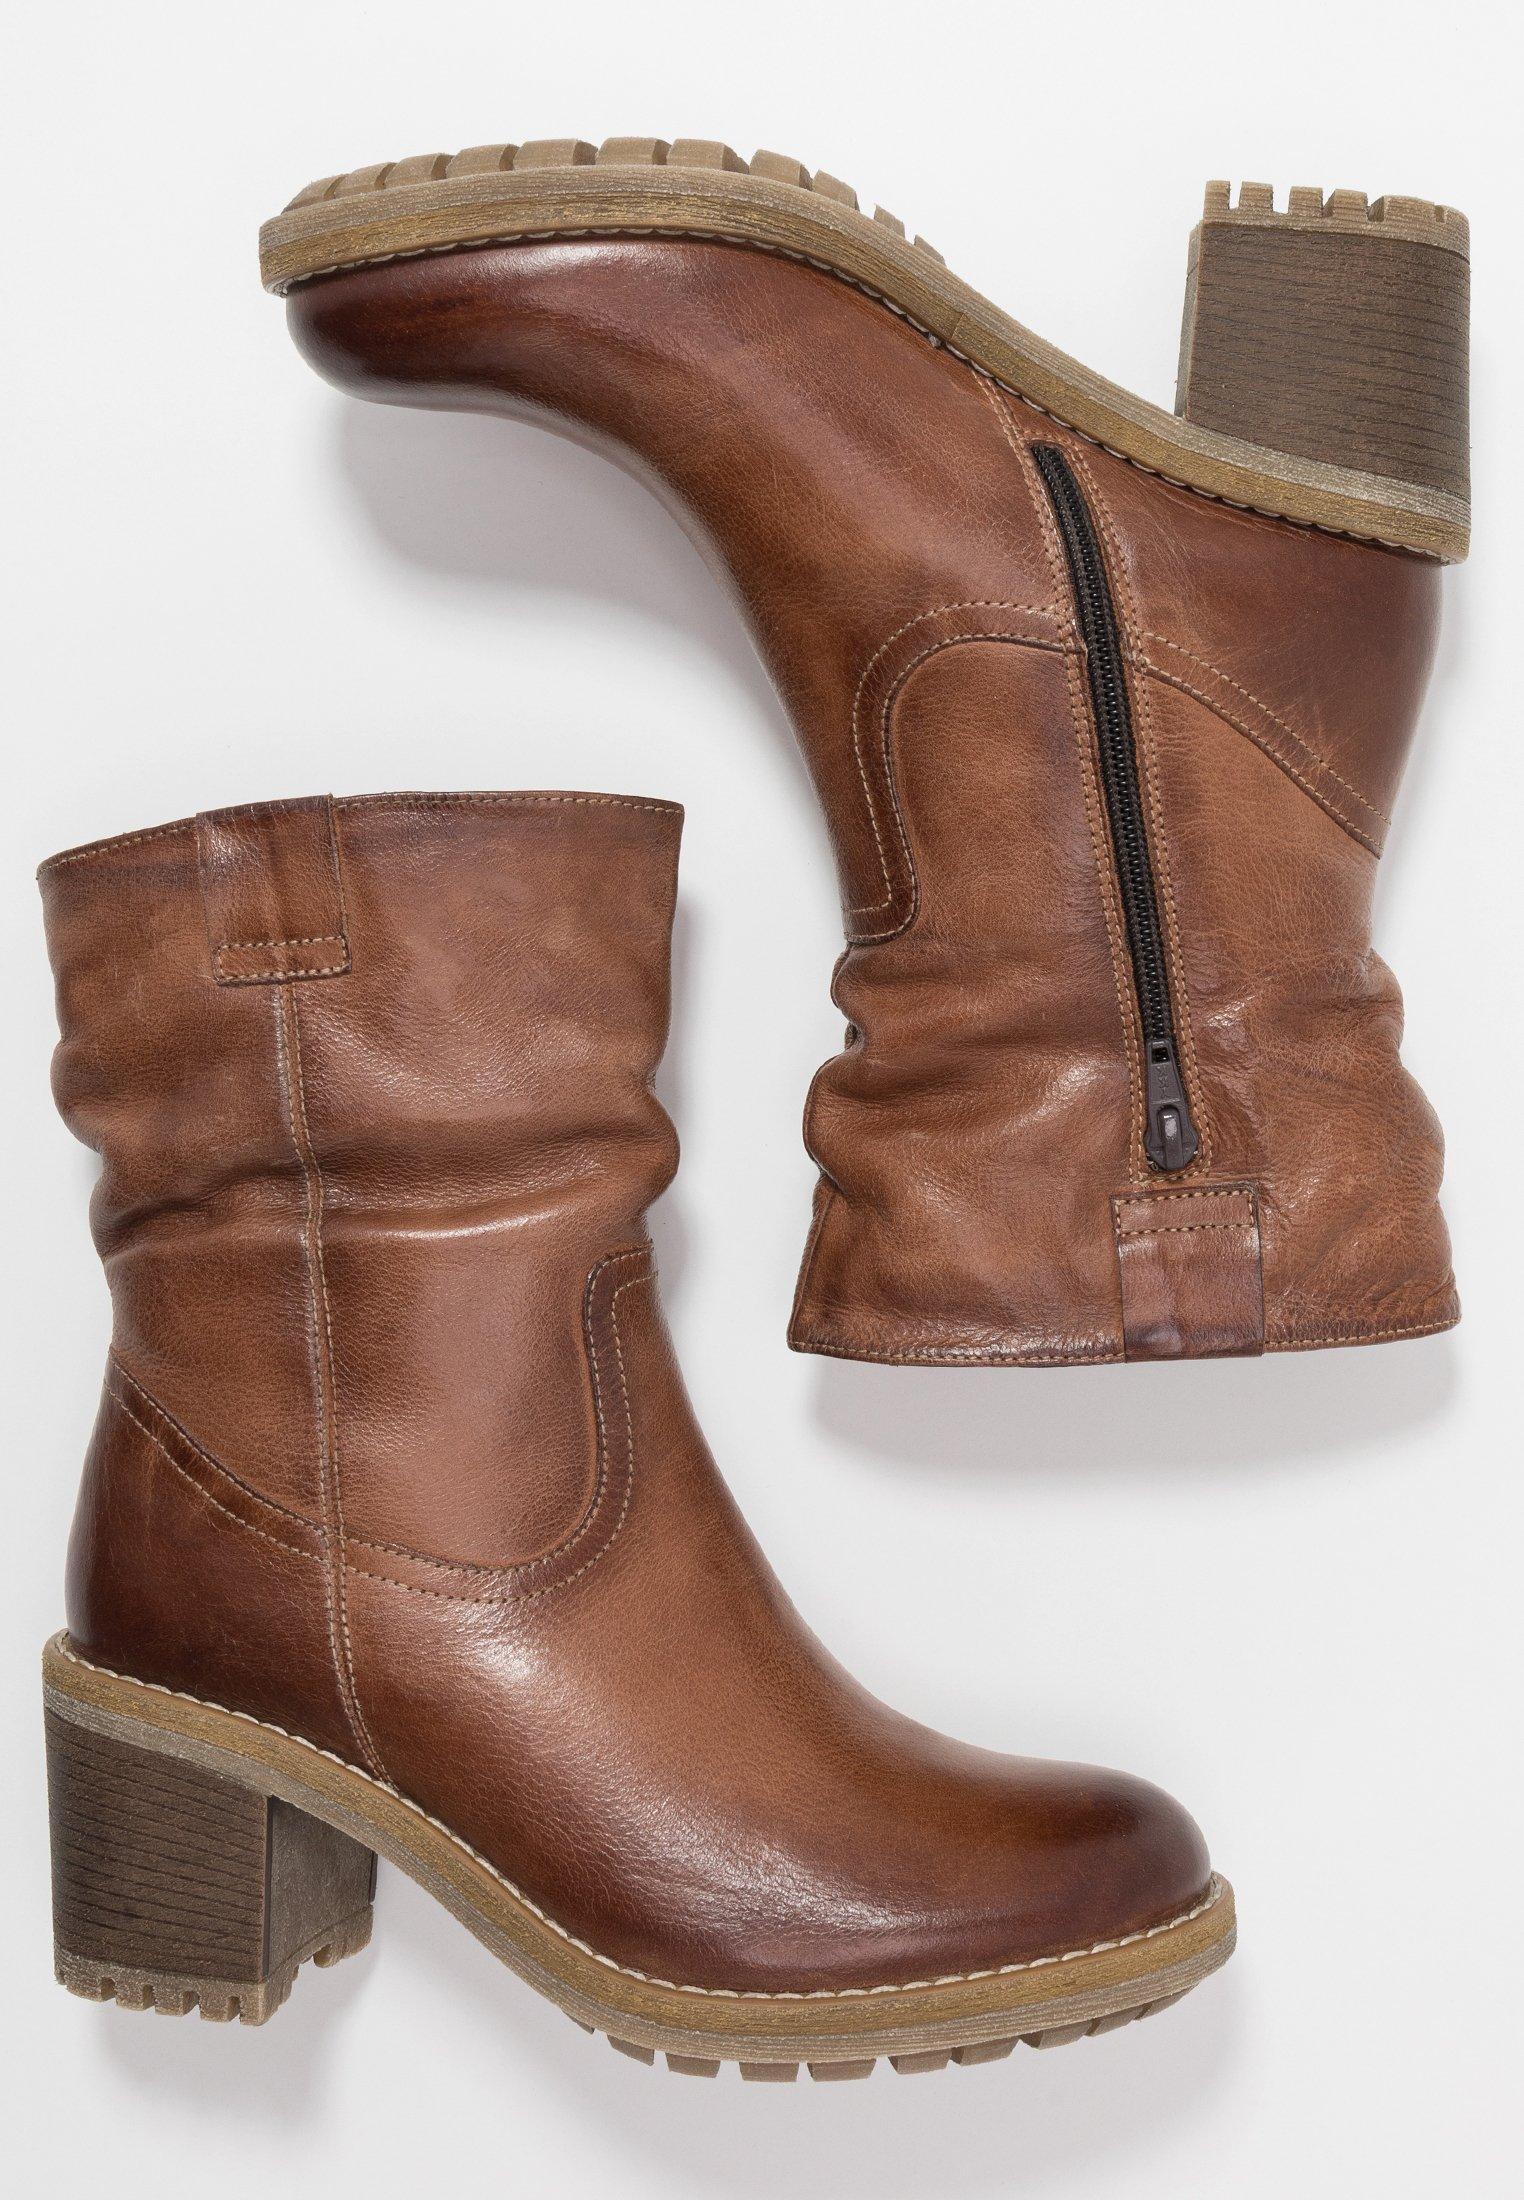 Anna Field Leather Winter Booties - Snowboot/winterstiefel Brown Black Friday